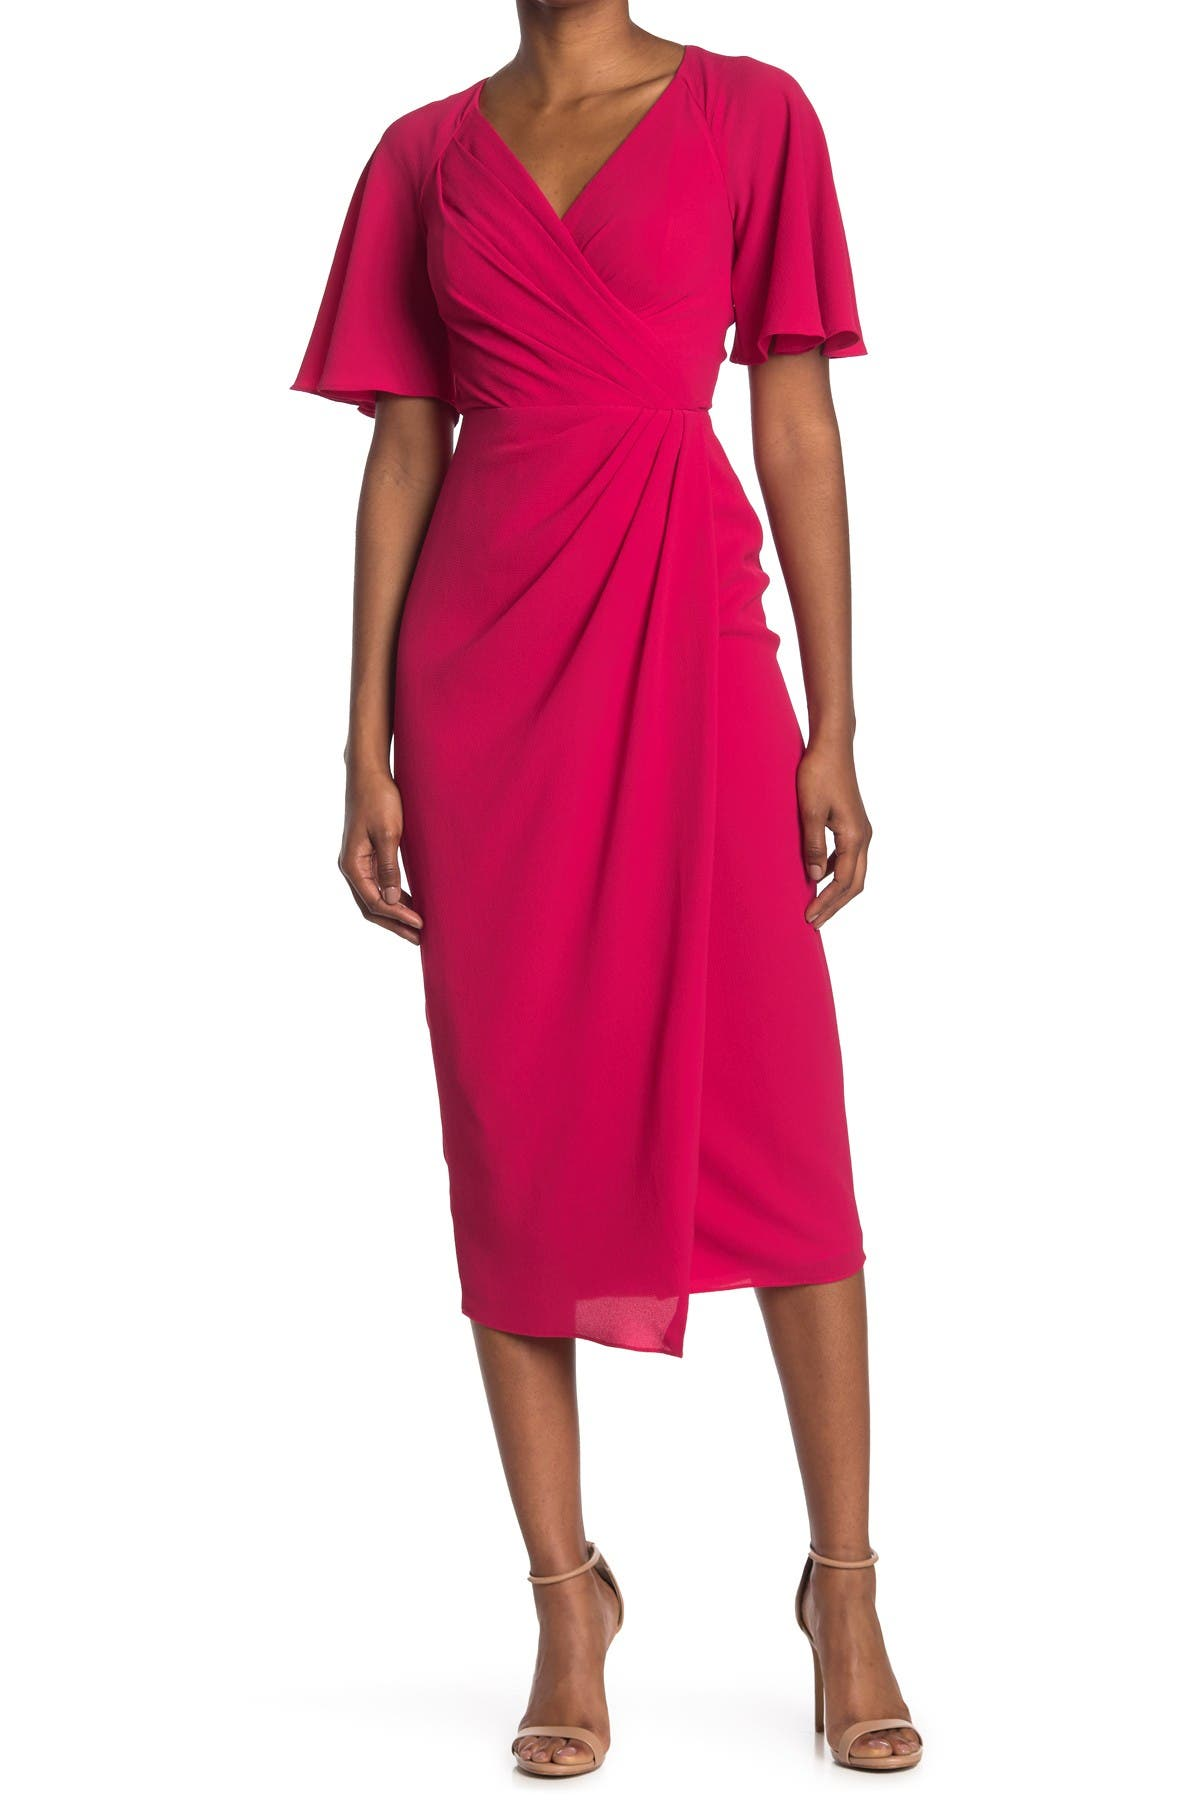 Image of Maggy London Side Drape Midi Dress